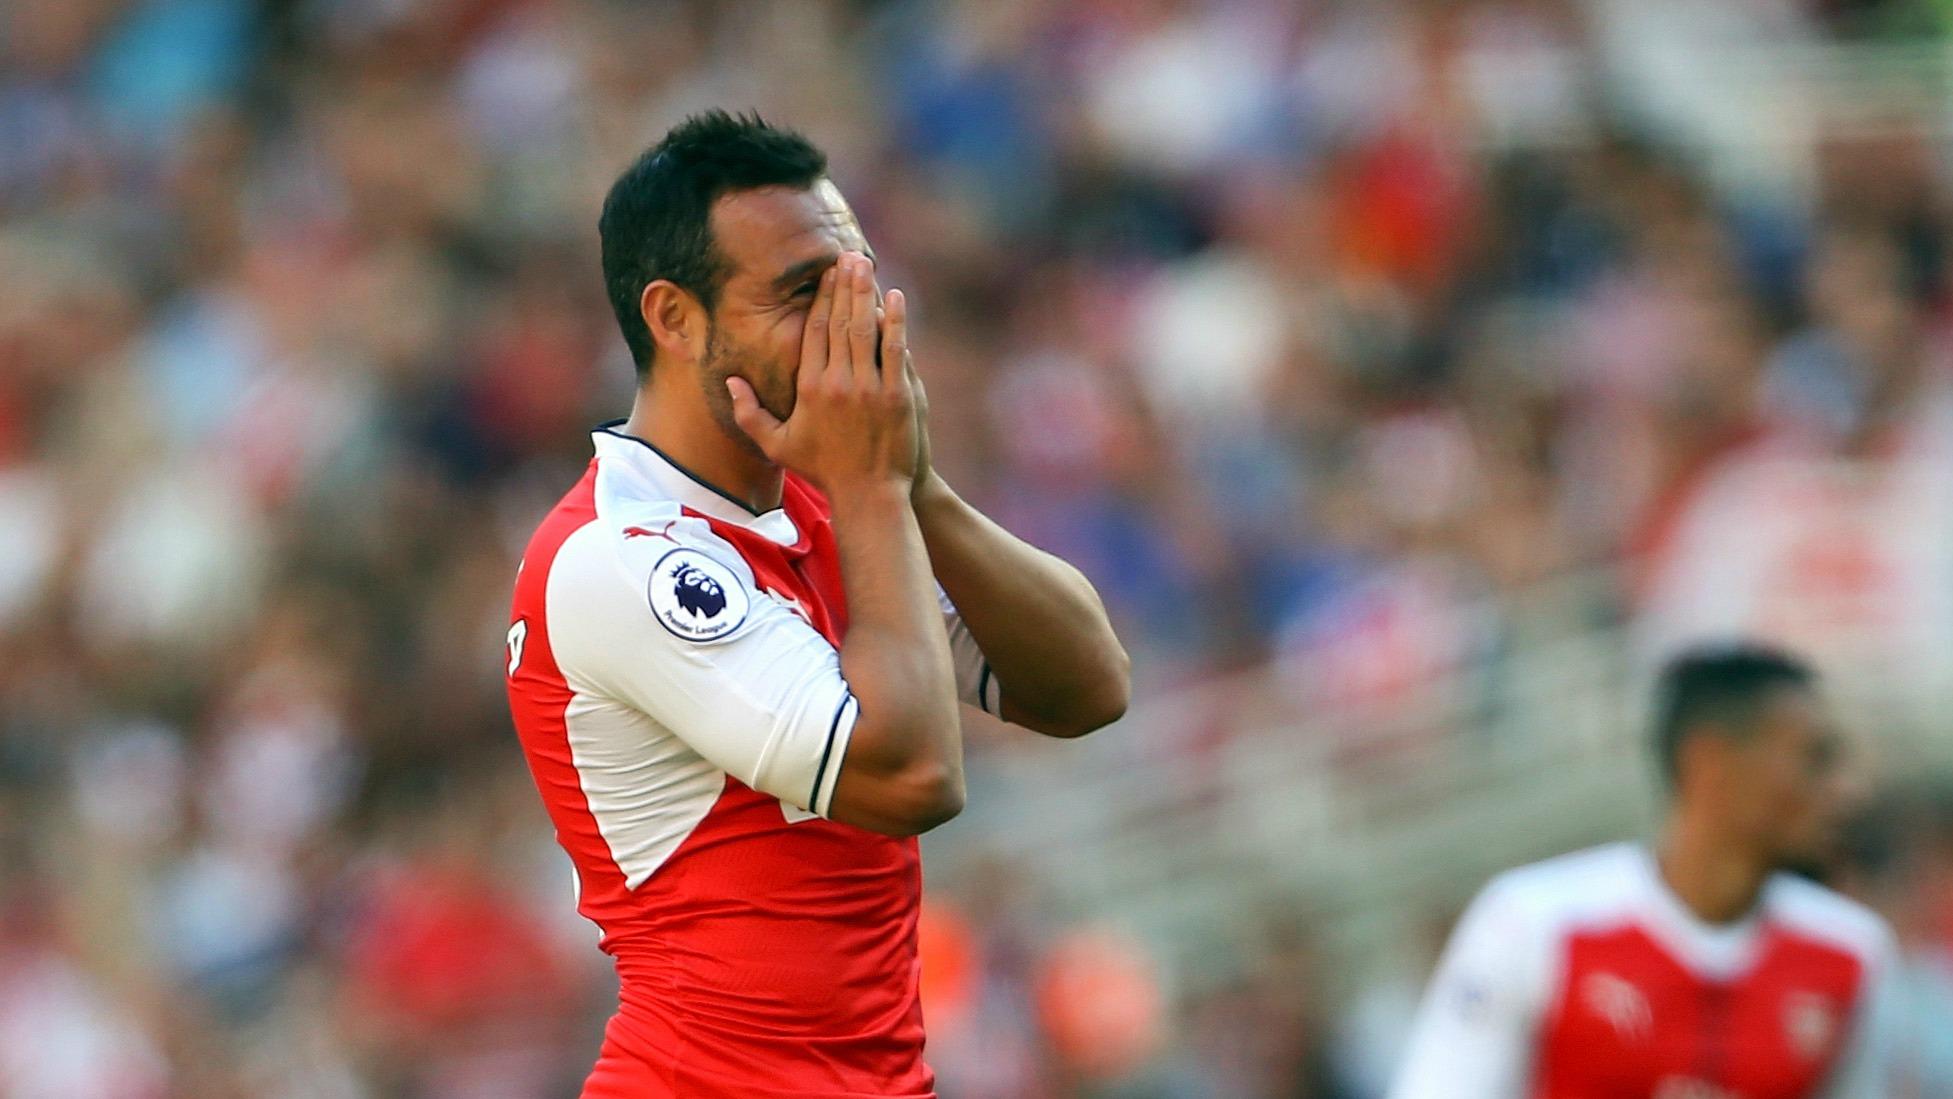 Arsenal will need Granit Xhaka to play (and shine) with Santi Cazorla injured